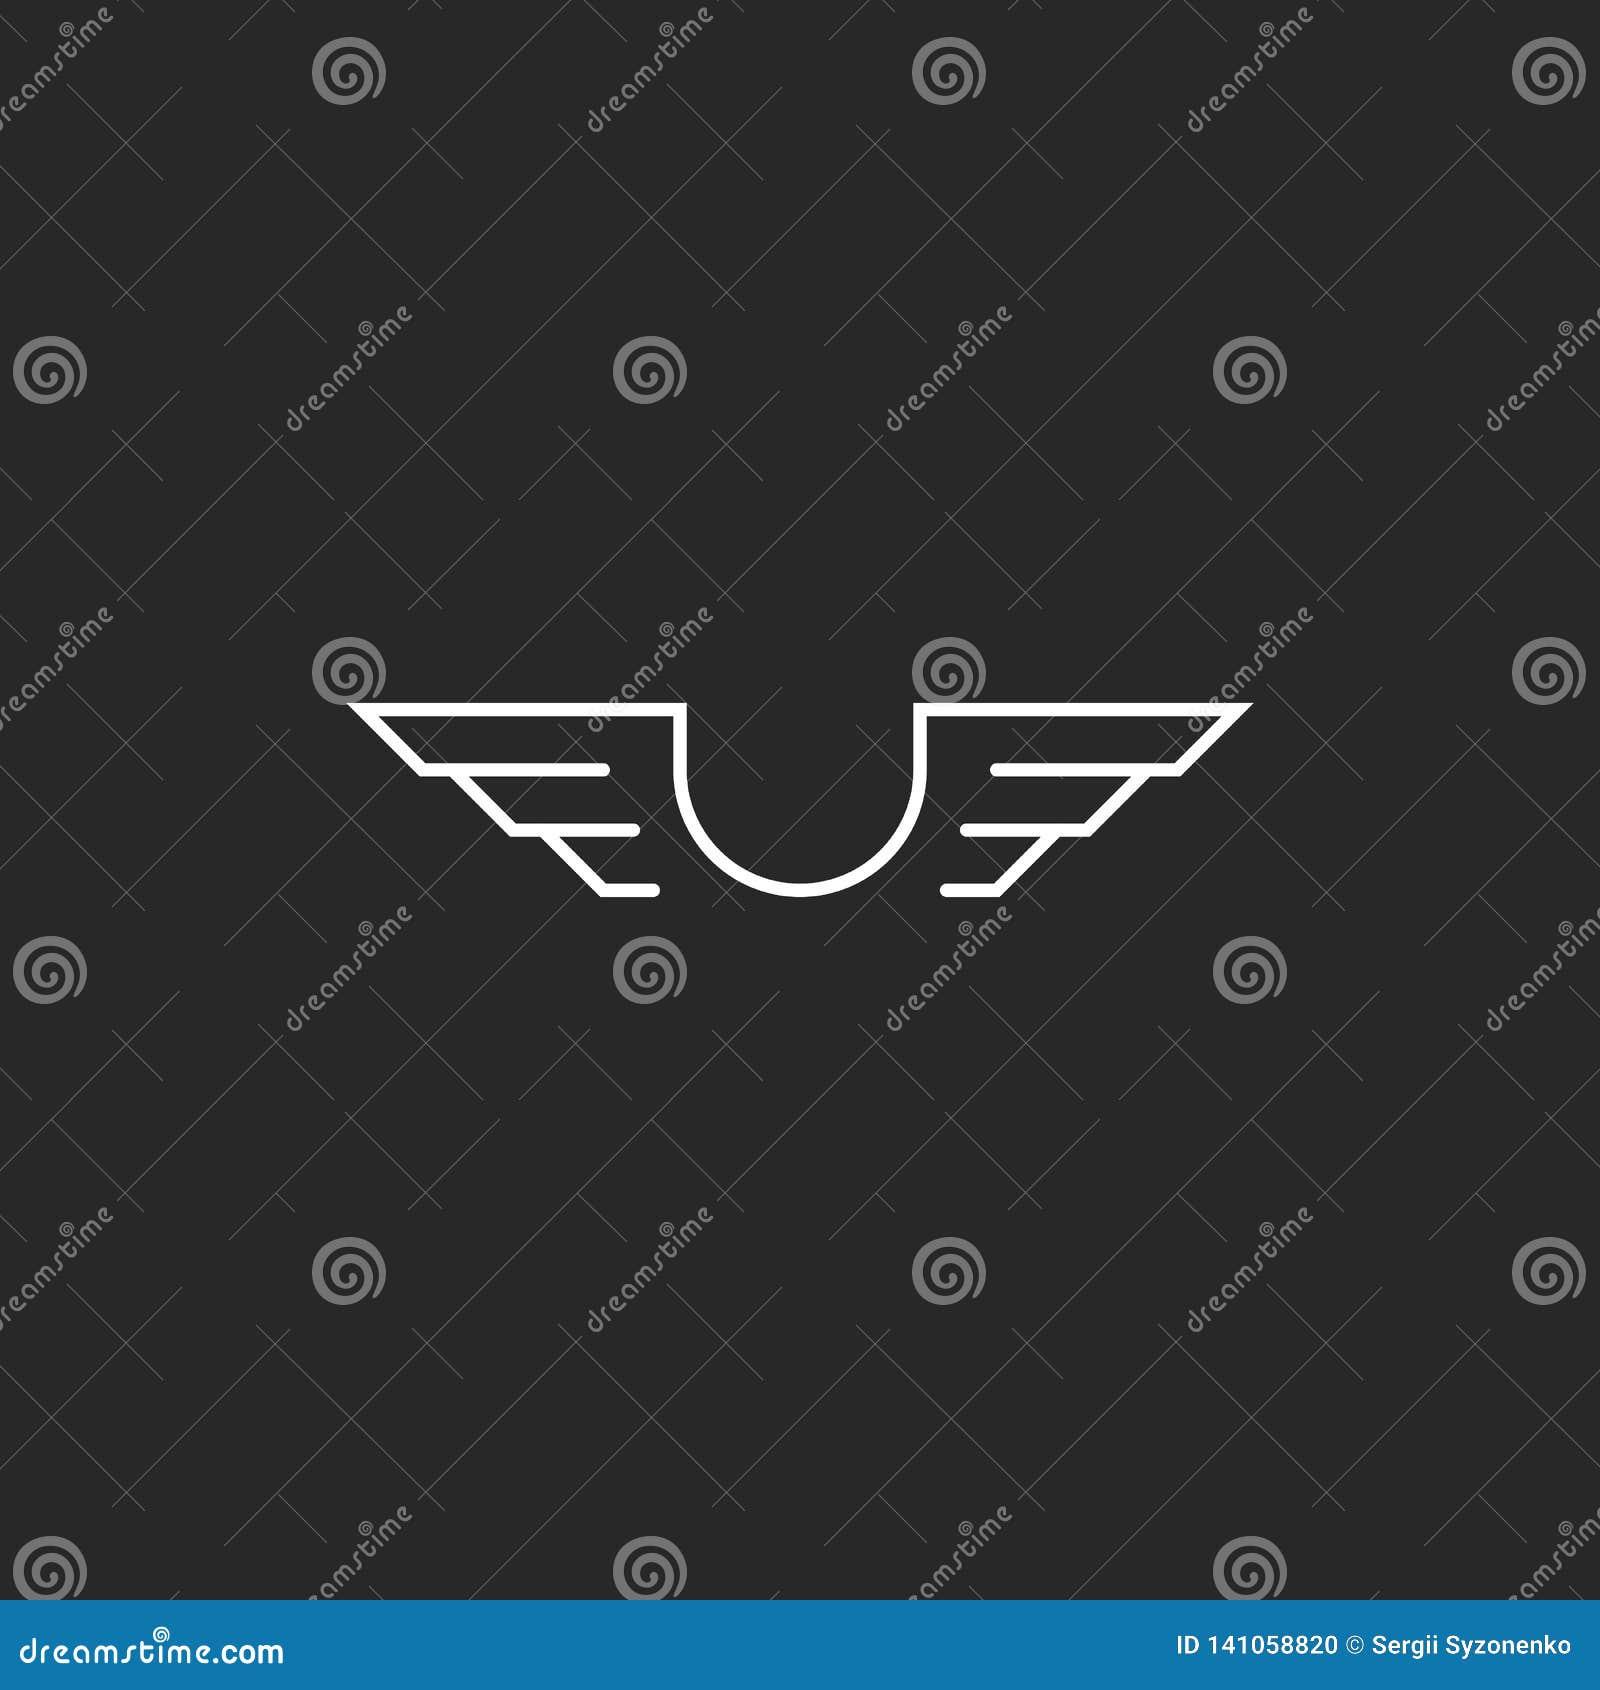 Letter U monogram wings logo mockup, thin line design element, creative idea flying emblem